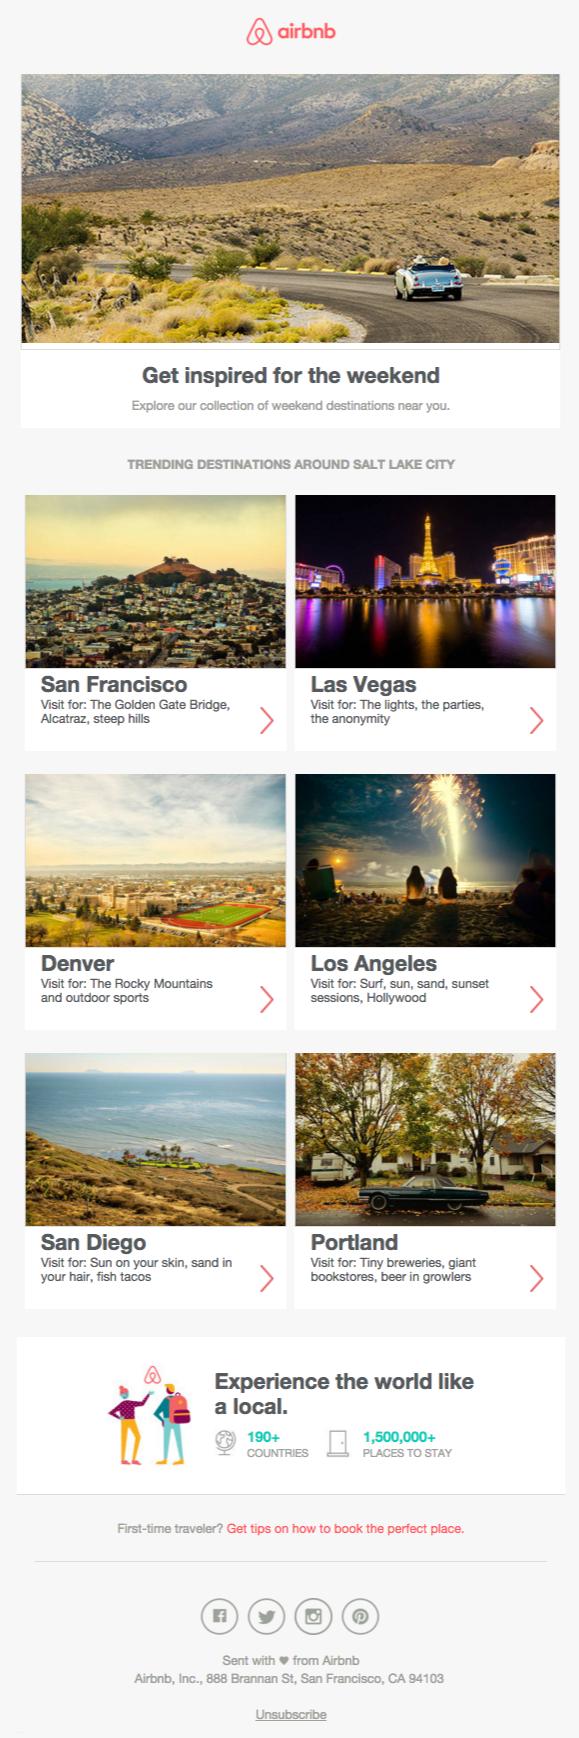 Airbnb newsletter 2015